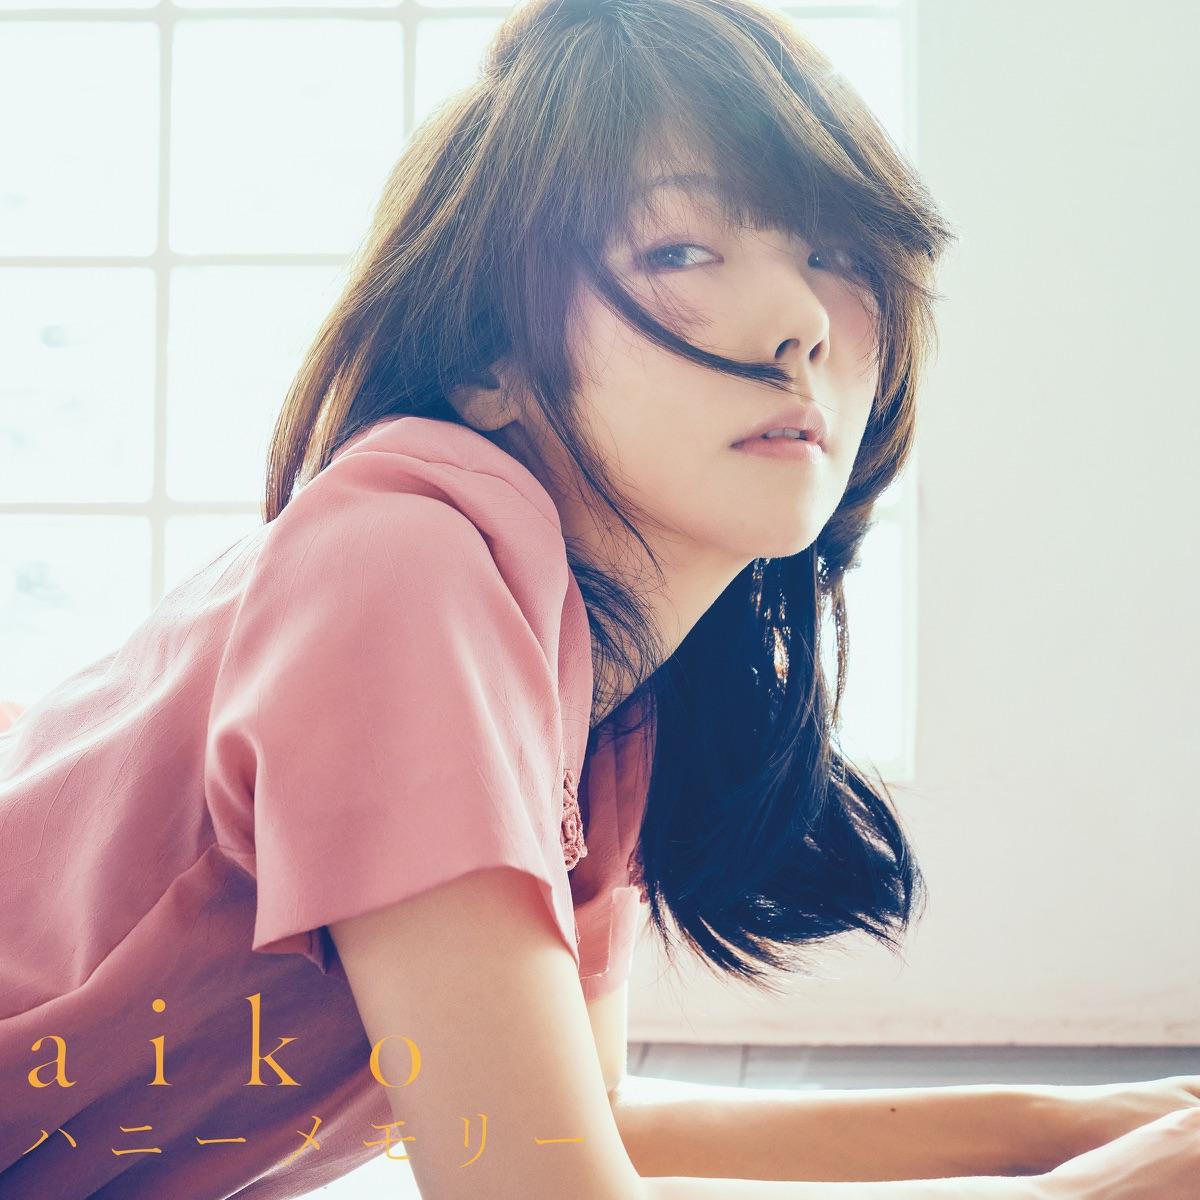 『aiko - 心焼け 歌詞』収録の『ハニーメモリー』ジャケット